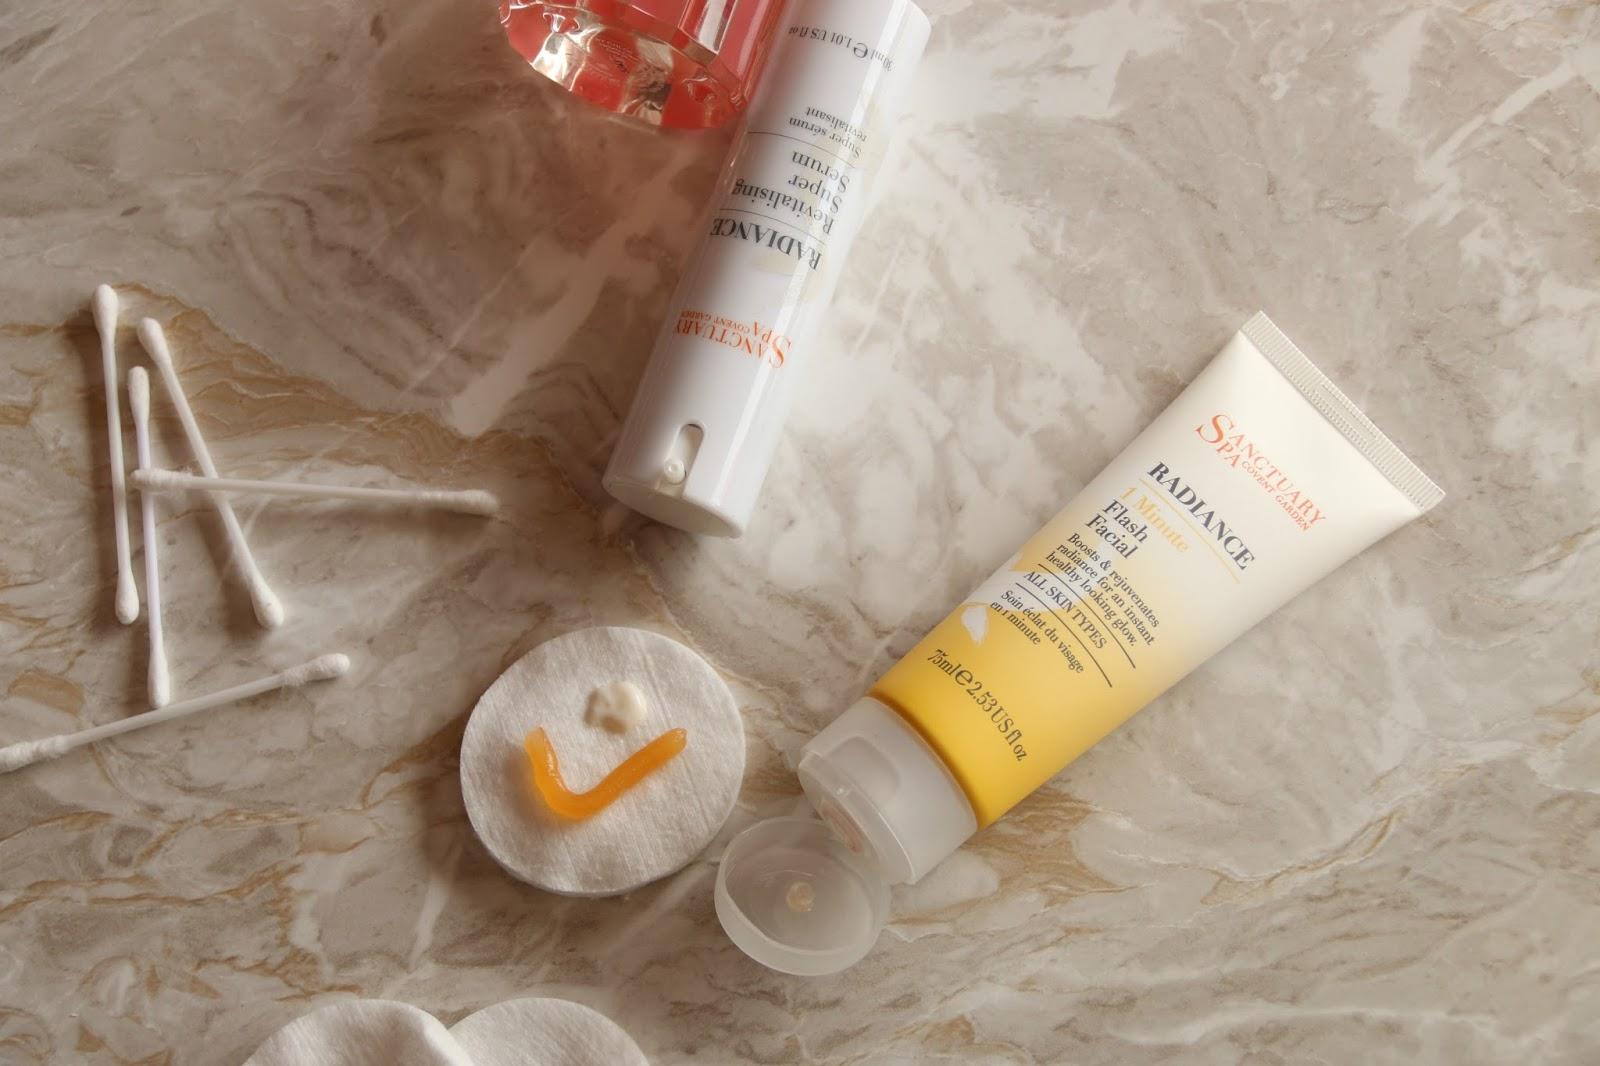 Sanctuary Spa Radiance 1 Minute Flash Facial Revitalising Super Serum